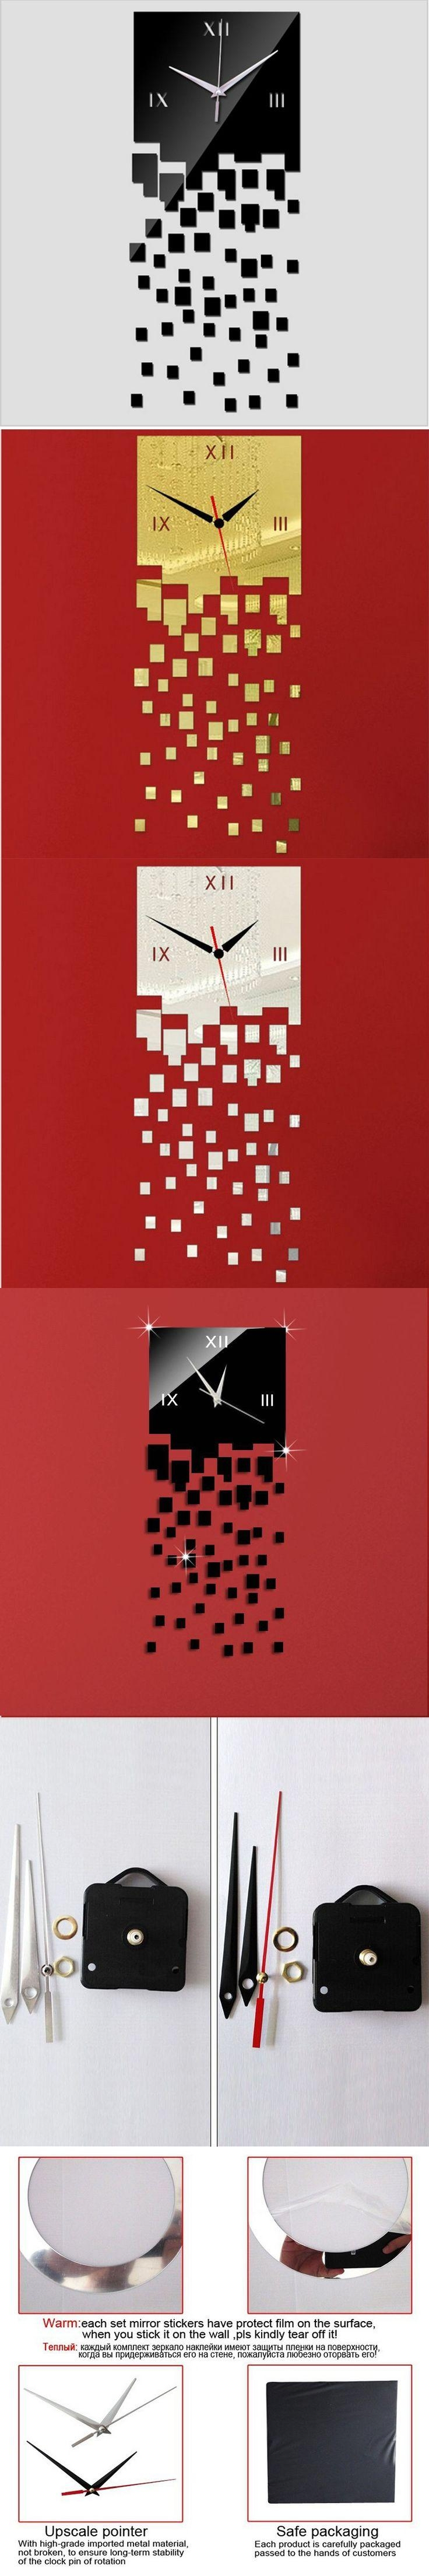 Best 10+ Mirror Wall Clock Ideas On Pinterest | Scandinavian Wall Within Italian Ceramic Wall Clock Decors (Image 4 of 20)